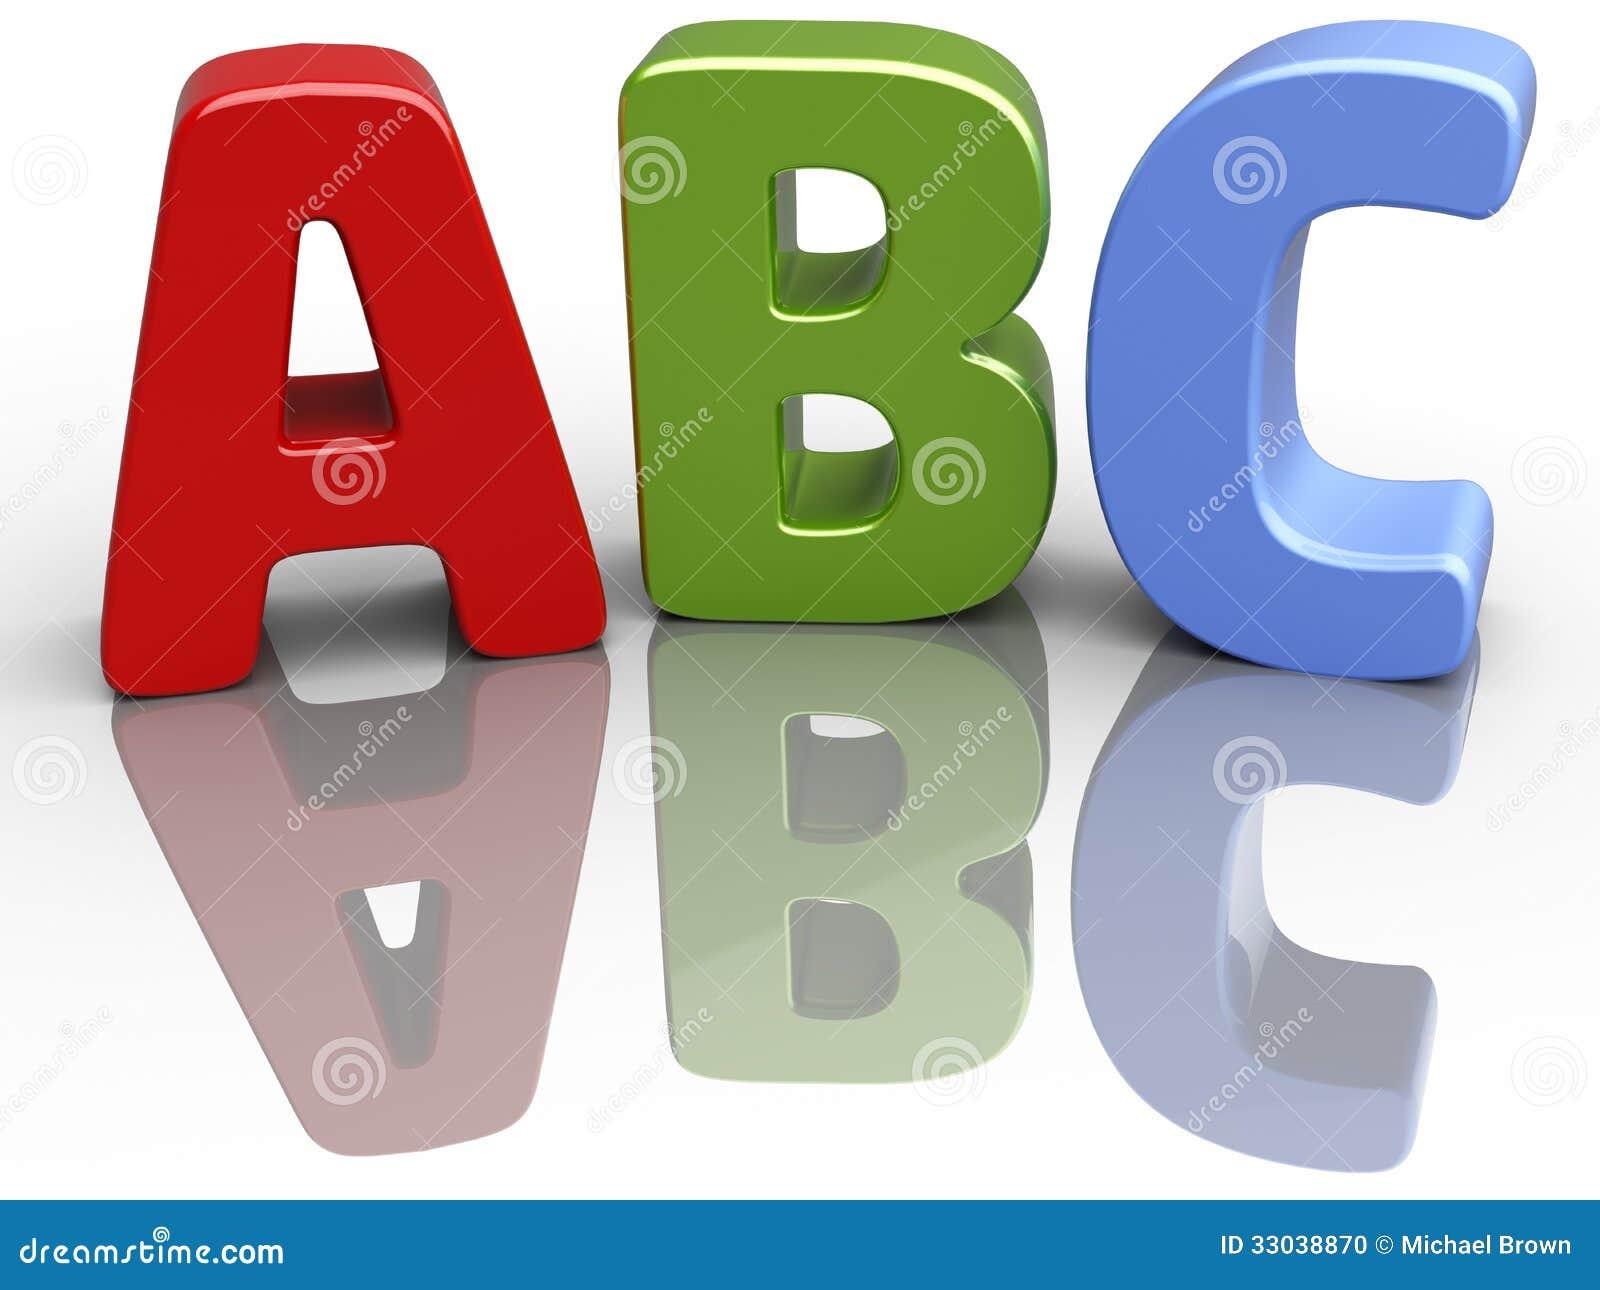 abc font alphabet education letters stock illustration